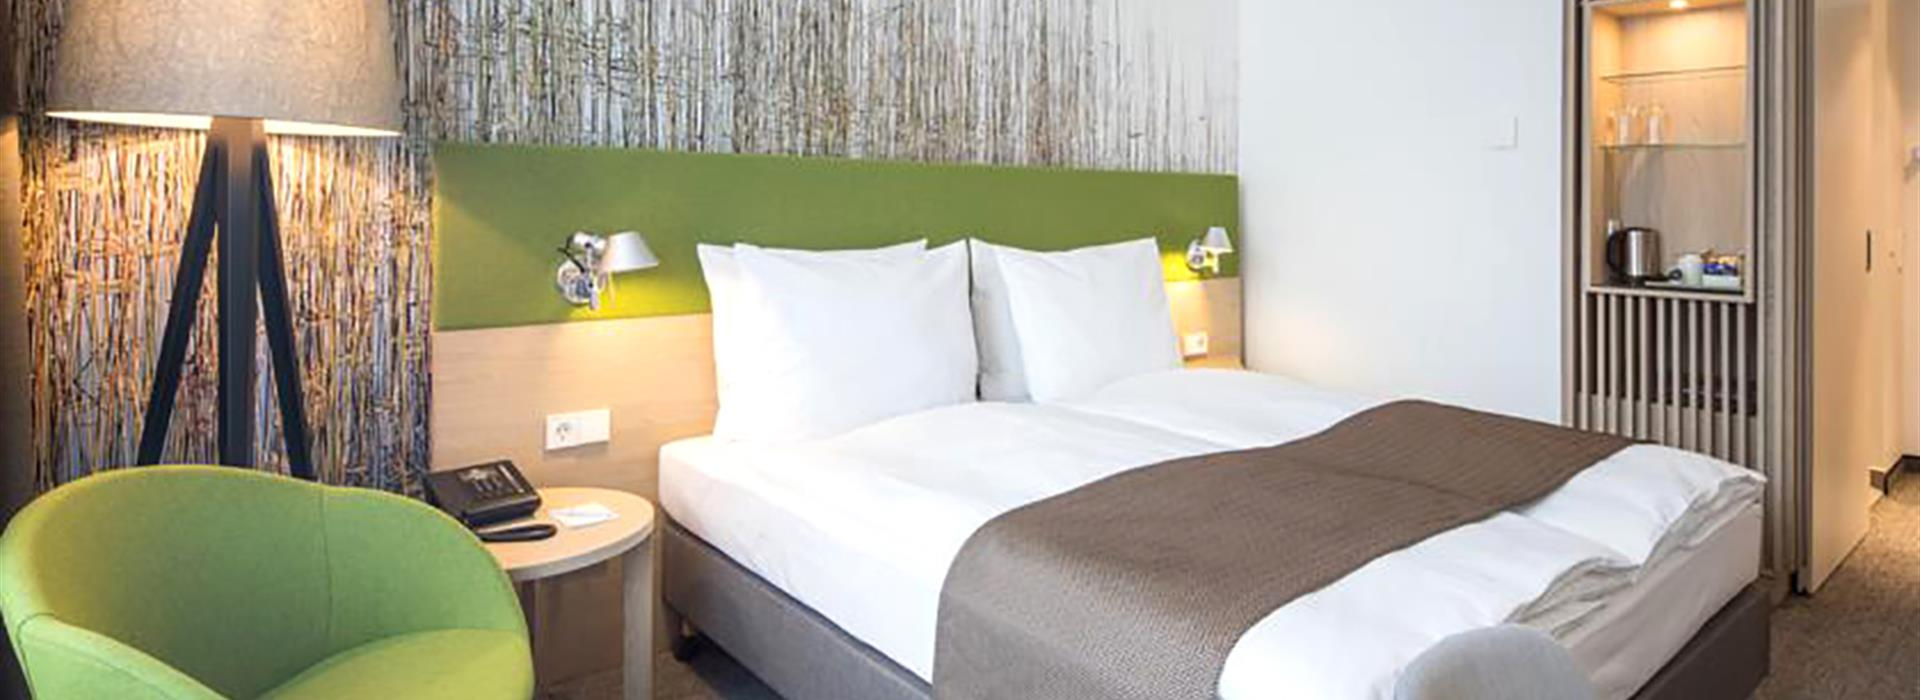 Holiday-Inn-Frankfurt-Alte-Oper-room2